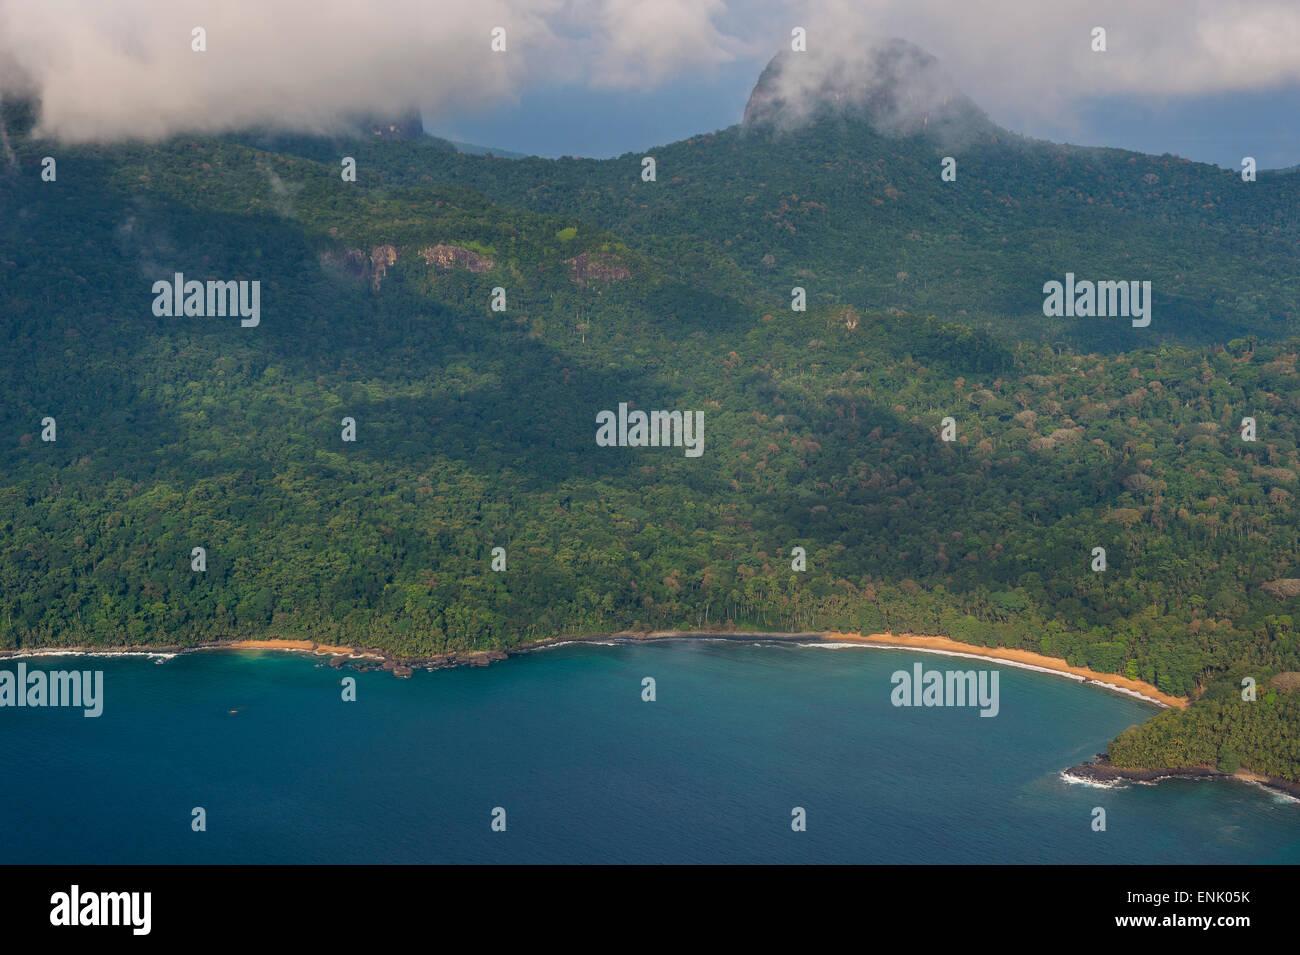 Luftaufnahme des UNESCO-Biosphären-Reservat, Principe, Sao Tome und Principe, Atlantik, Afrika Stockbild